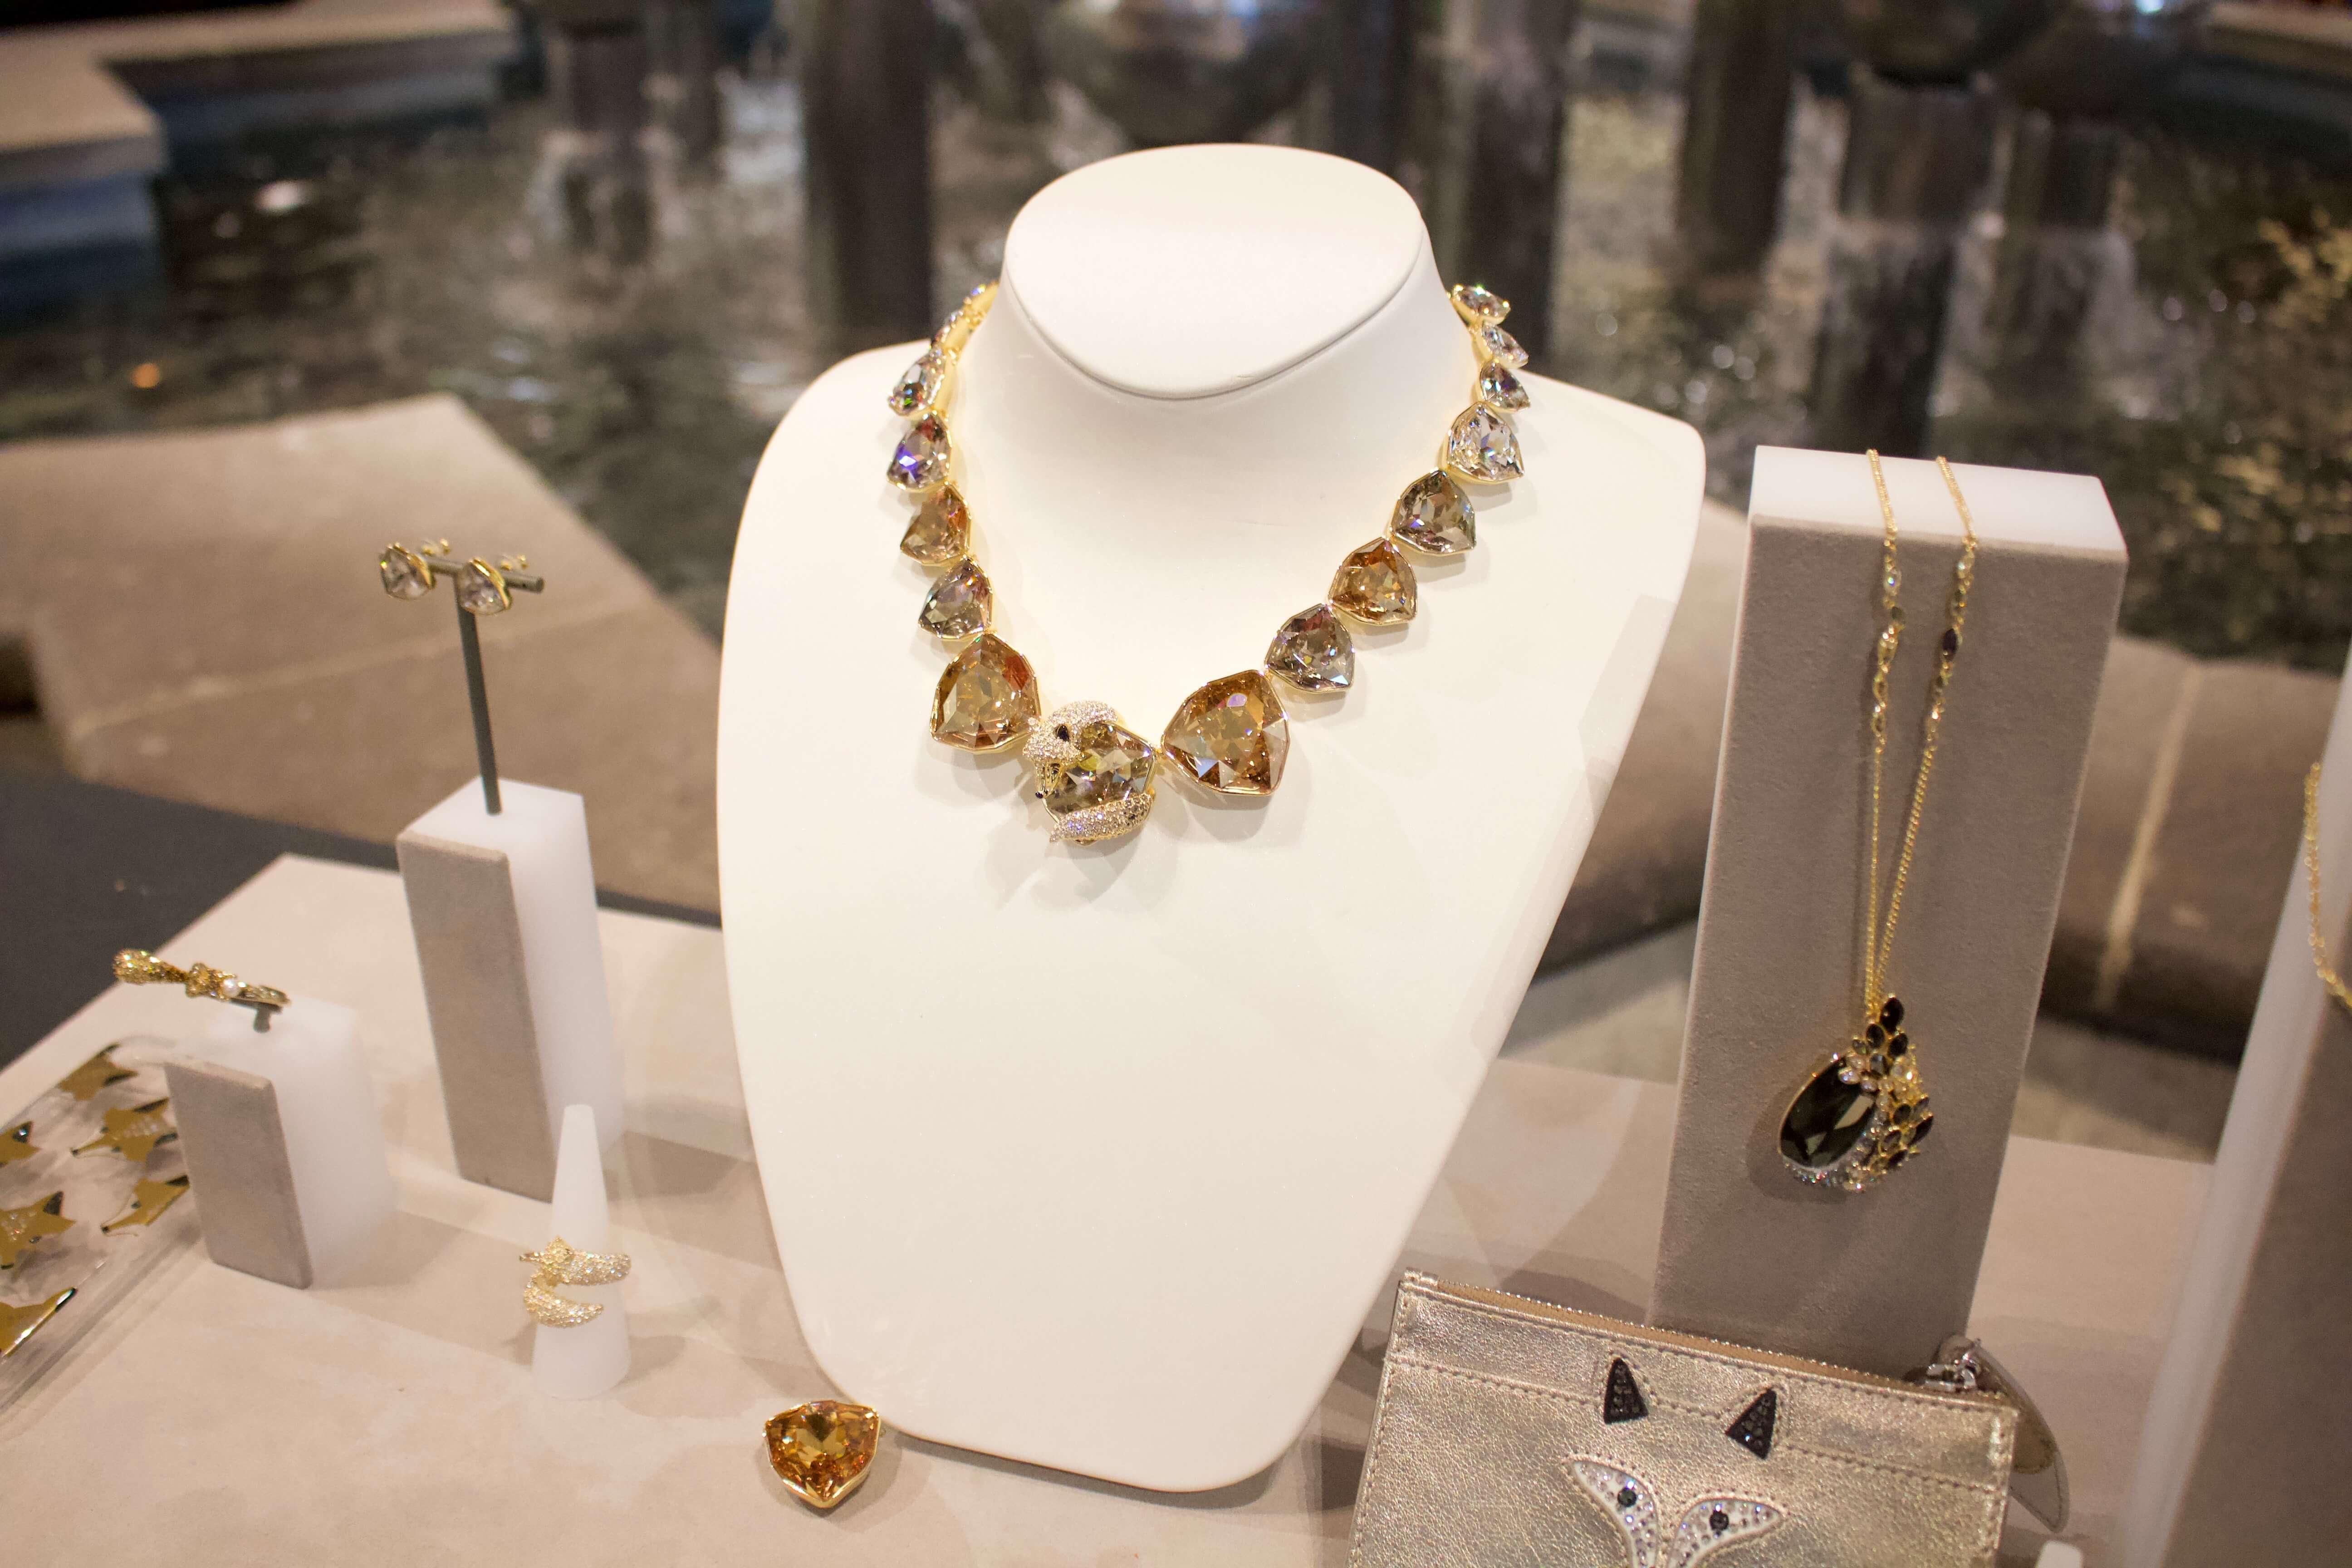 swarovski holiday necklace brea mall